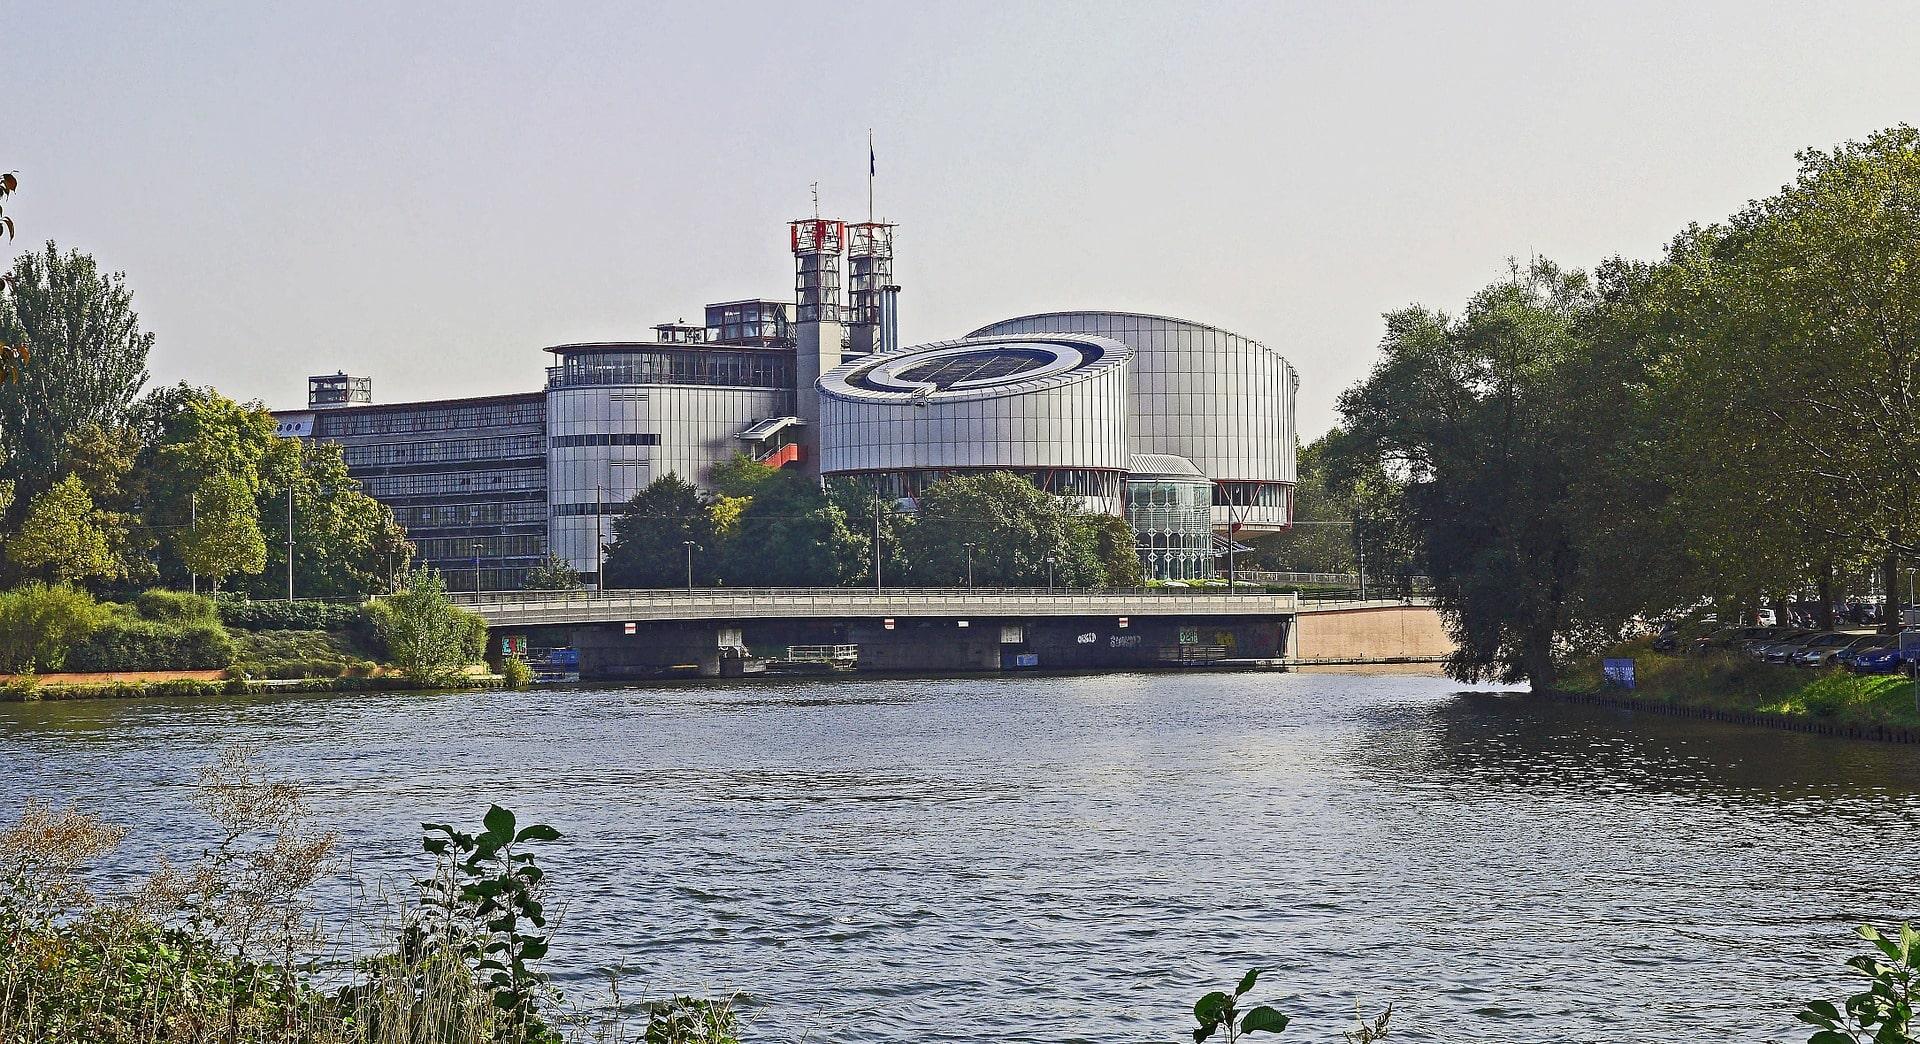 european-court-of-justice-12797201920-min.jpg